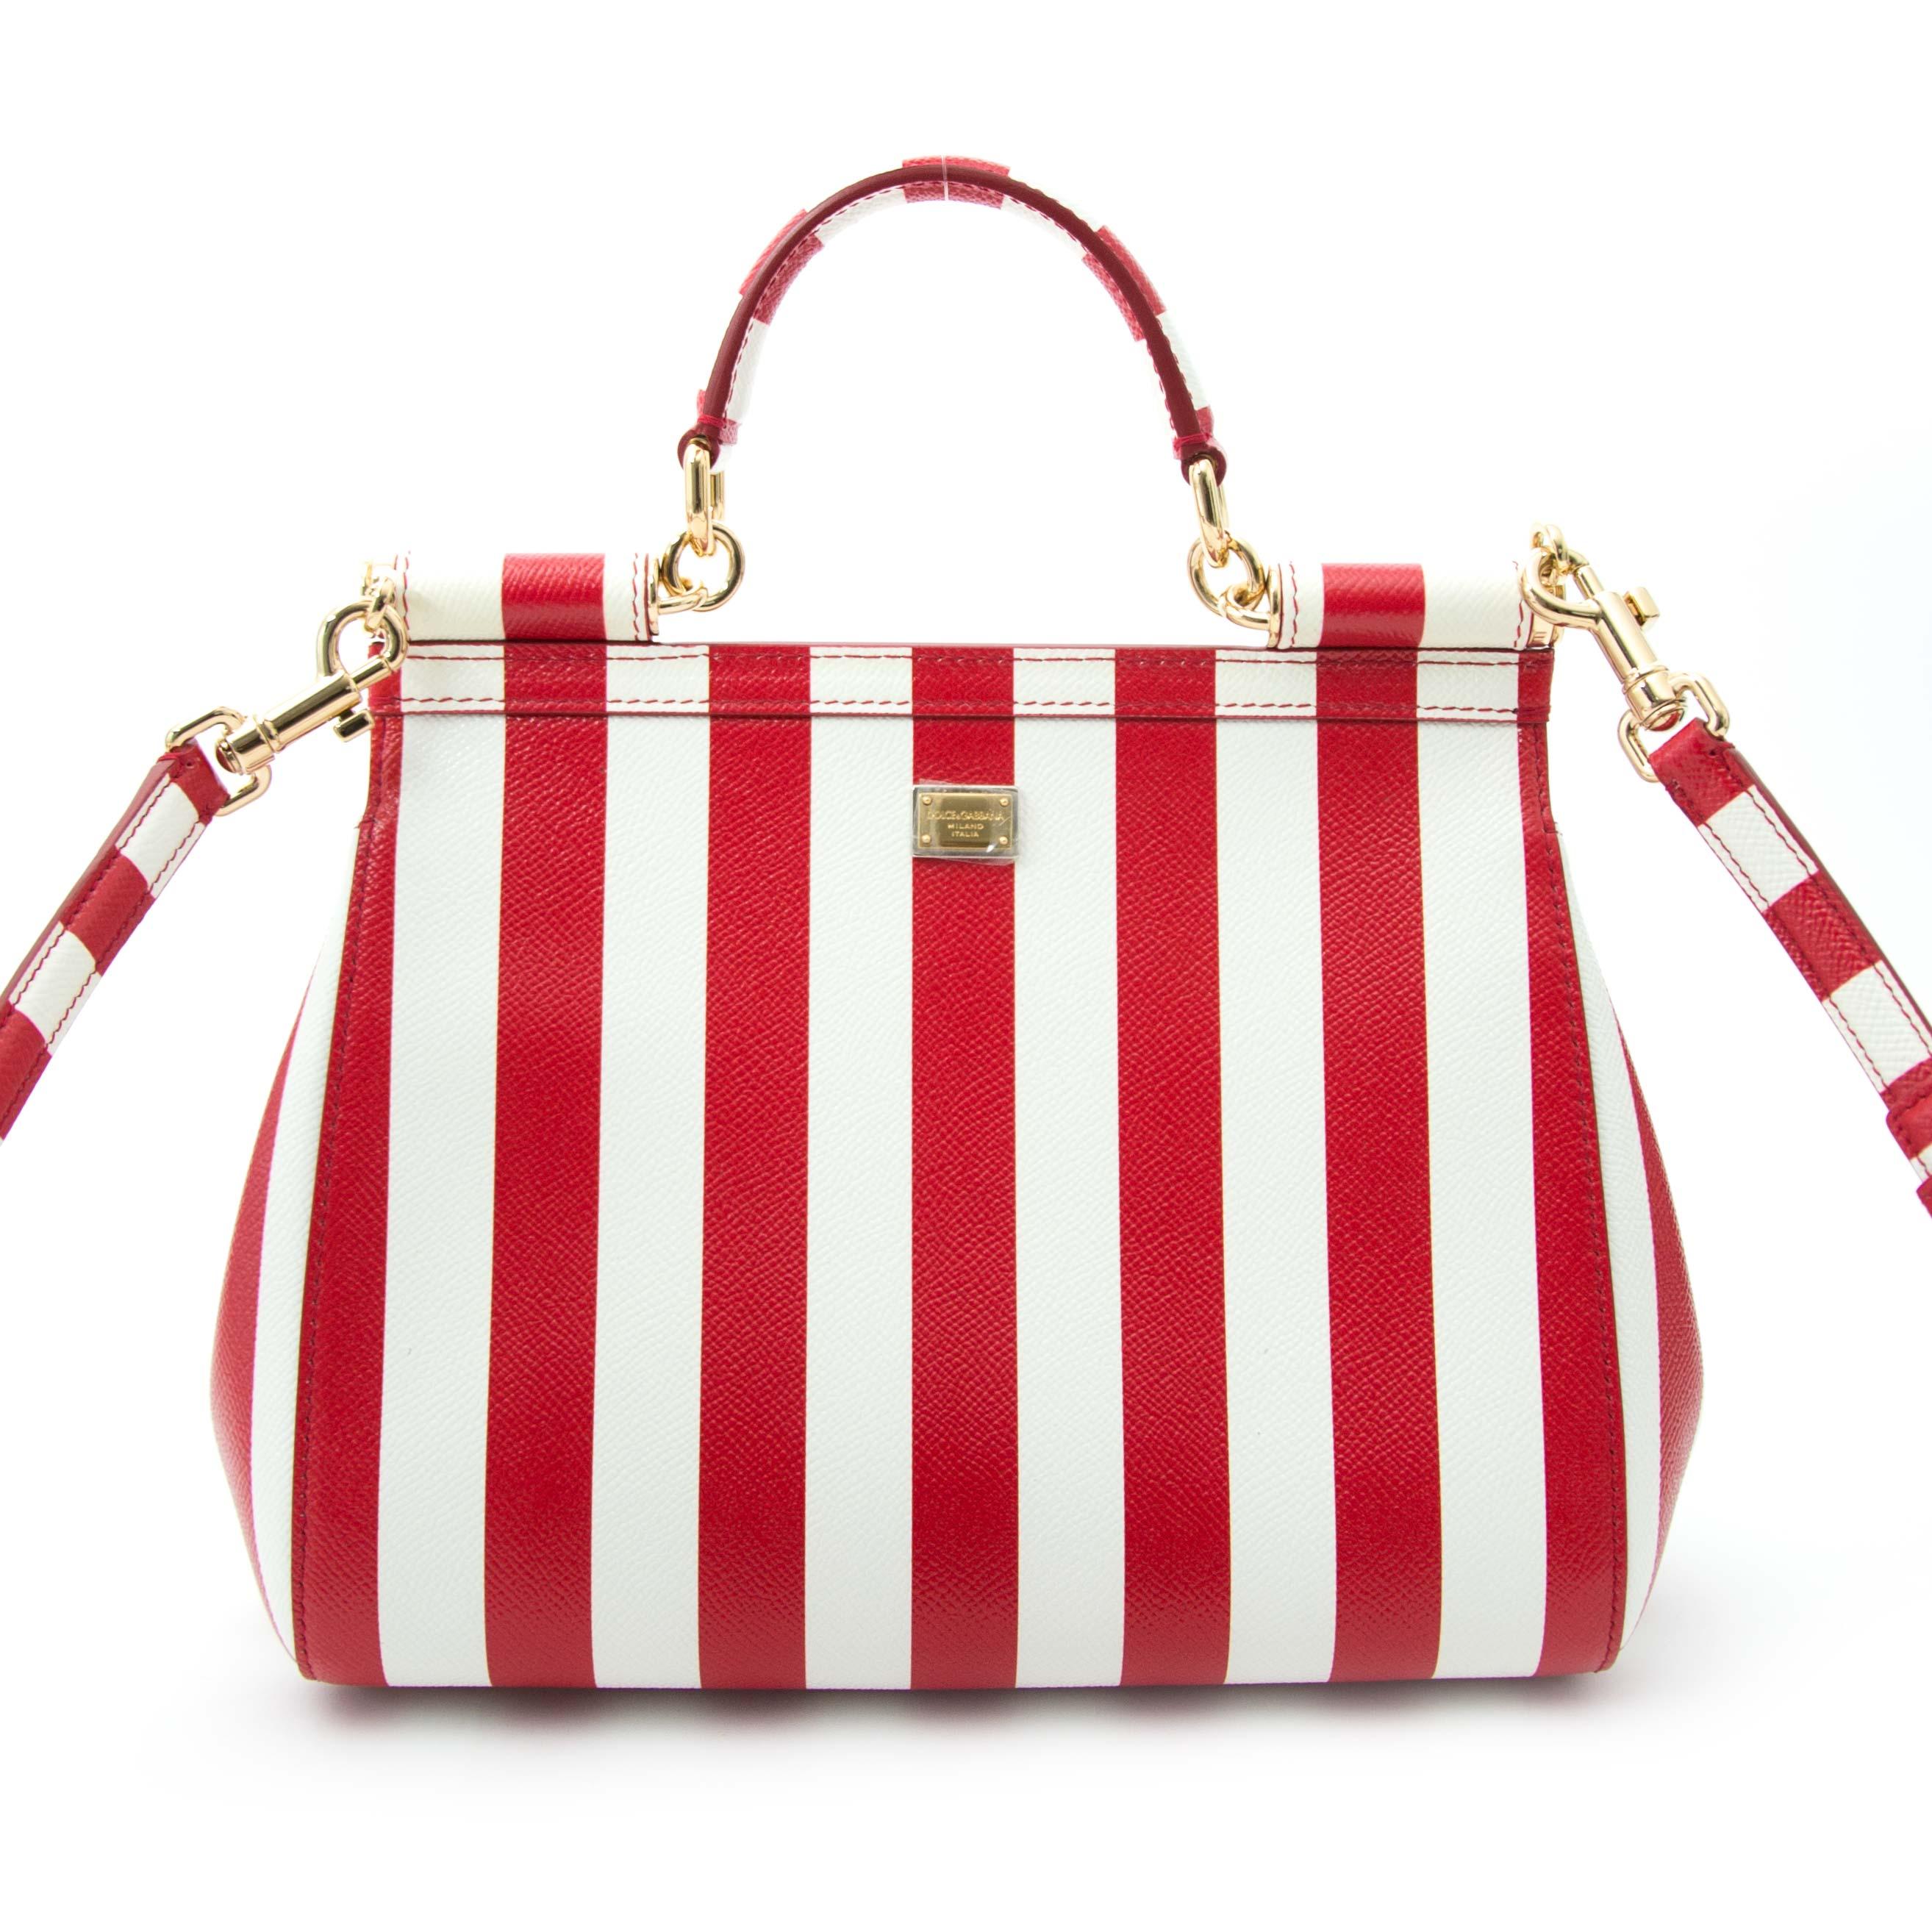 koop veilig online aan de beste prijs Dolce & Gabbana  Red and White Striped Lemons Miss Sicily Bag